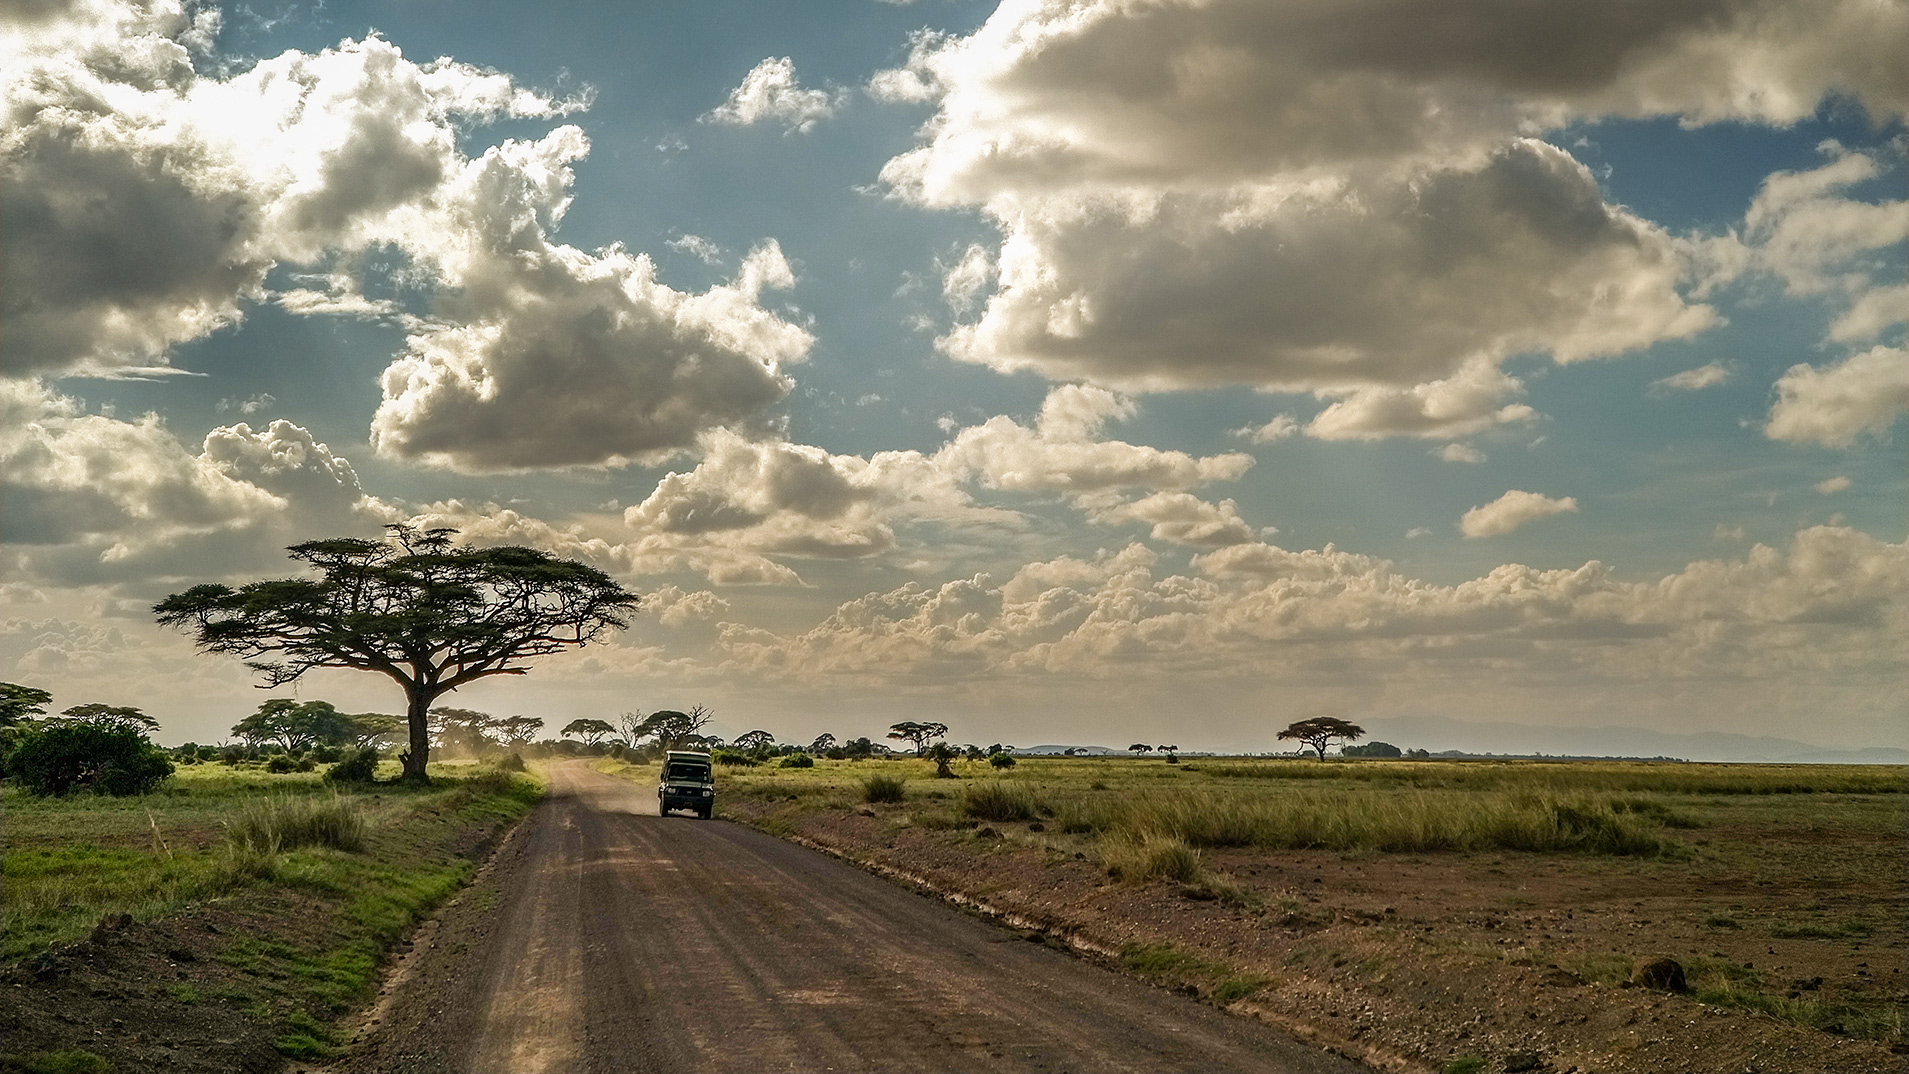 Safari w Kenii droga fotografia mobilna